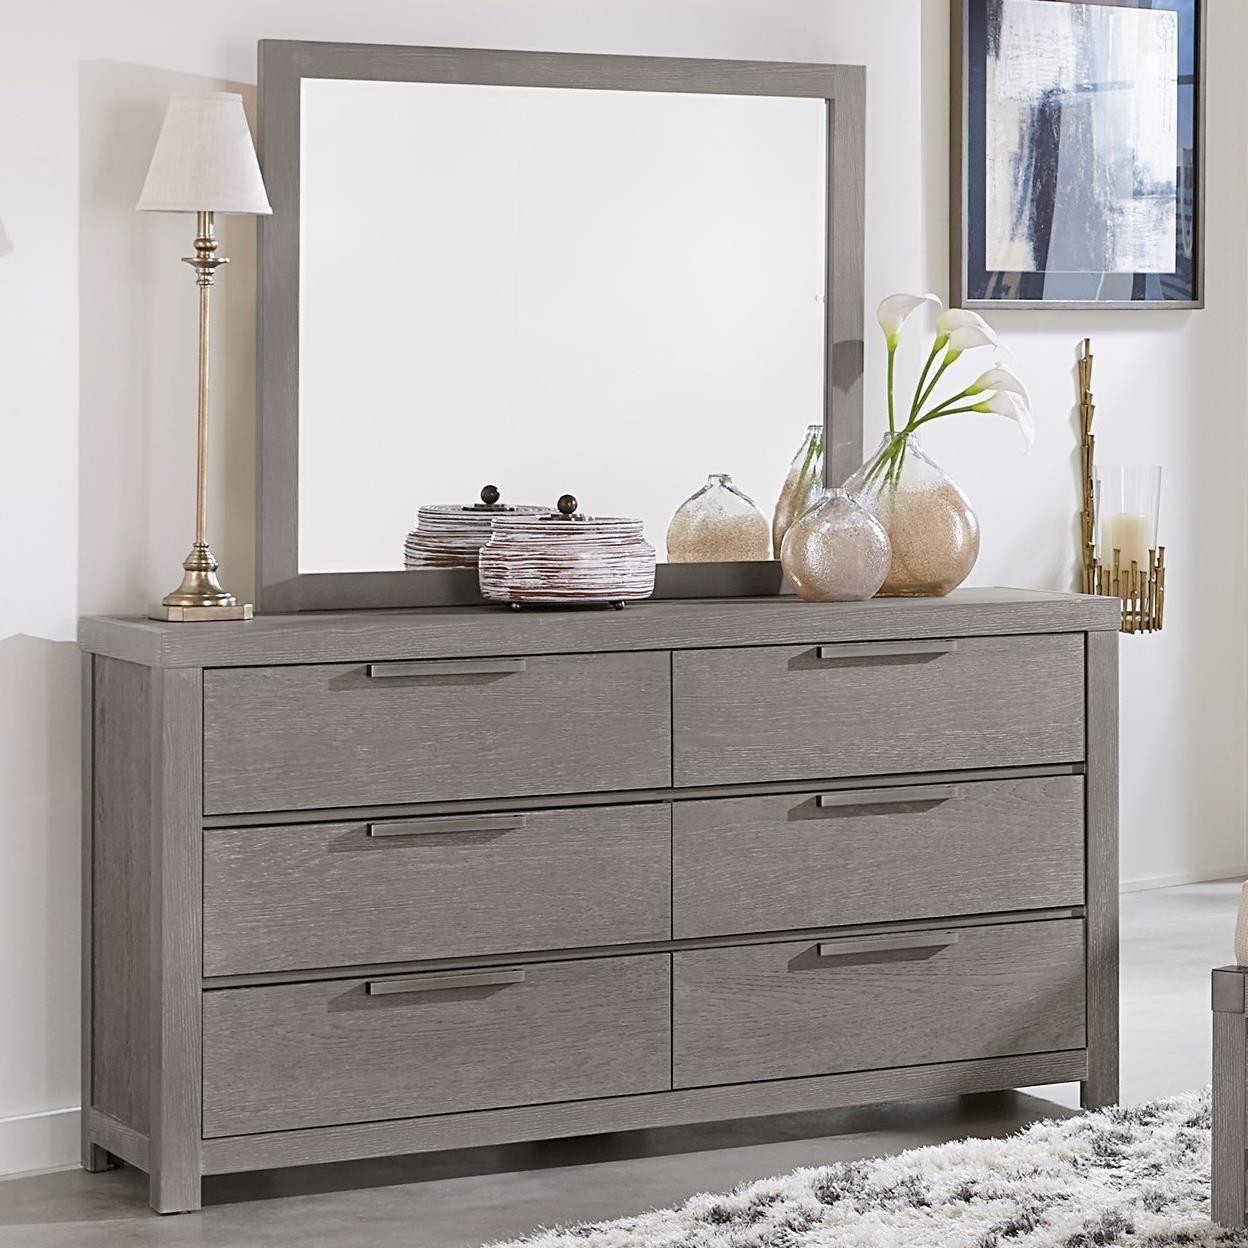 Vaughan Bassett American Modern Dresser & Landscape Mirror - Item Number: 651-002+446